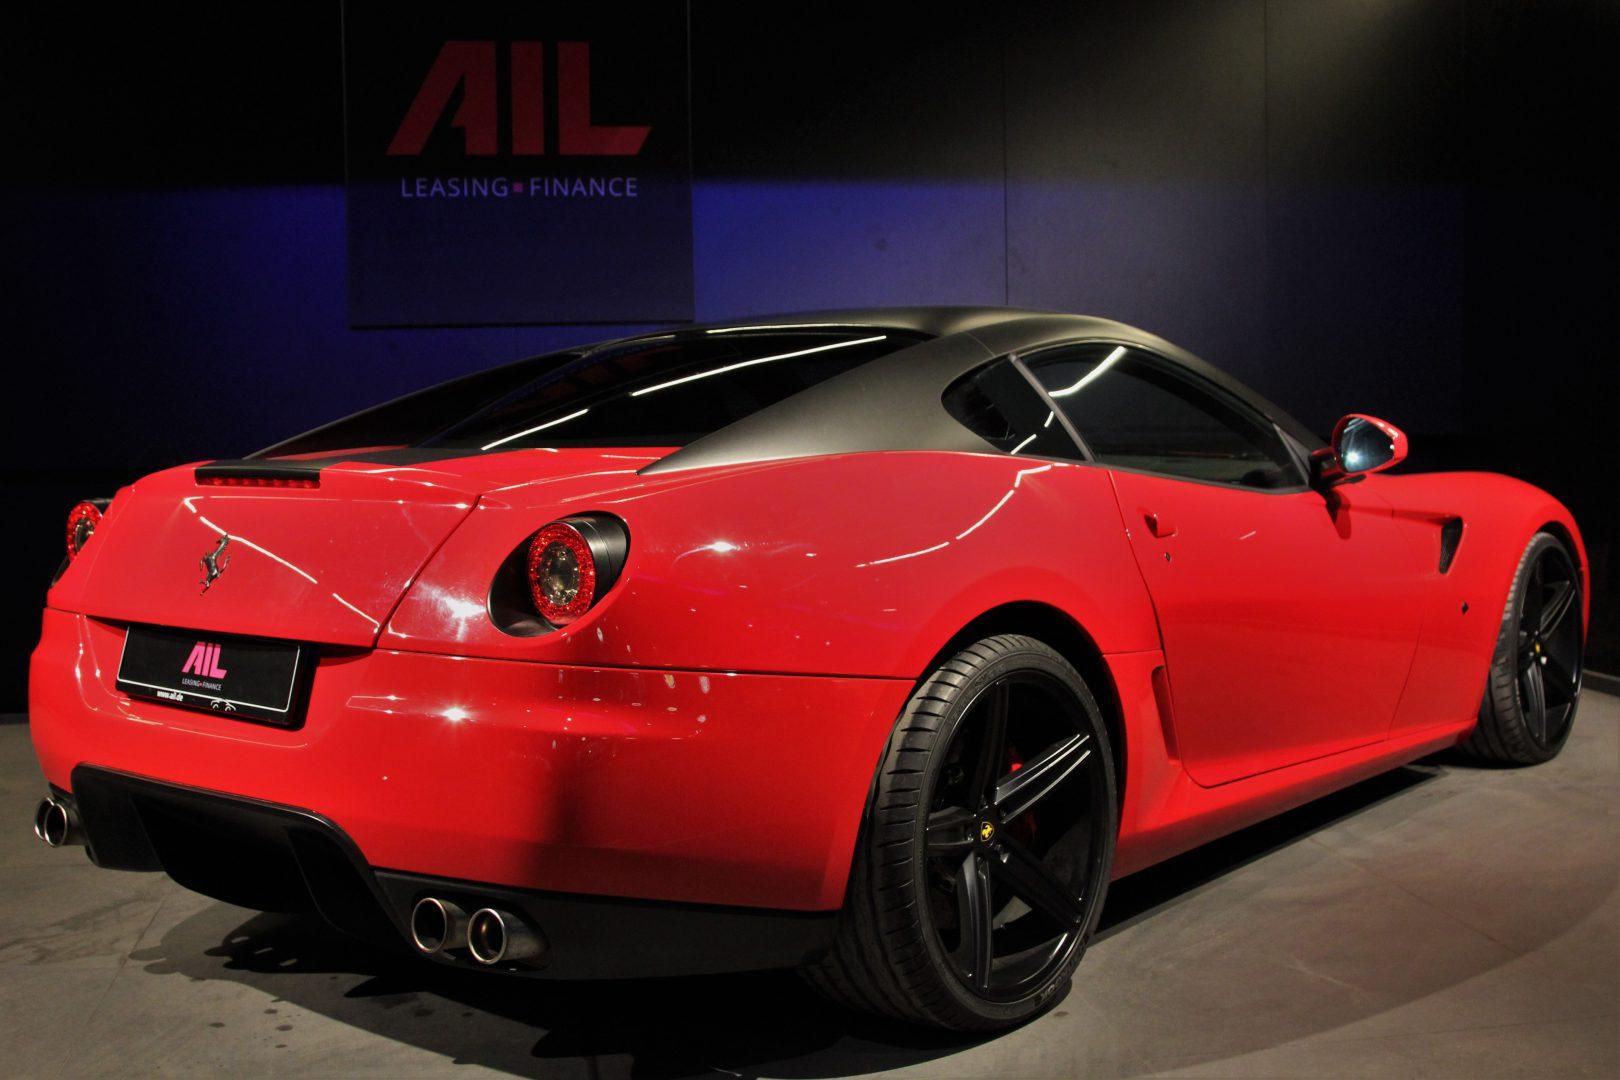 AIL Ferrari 599 GTB F1 Carbon Paket  1